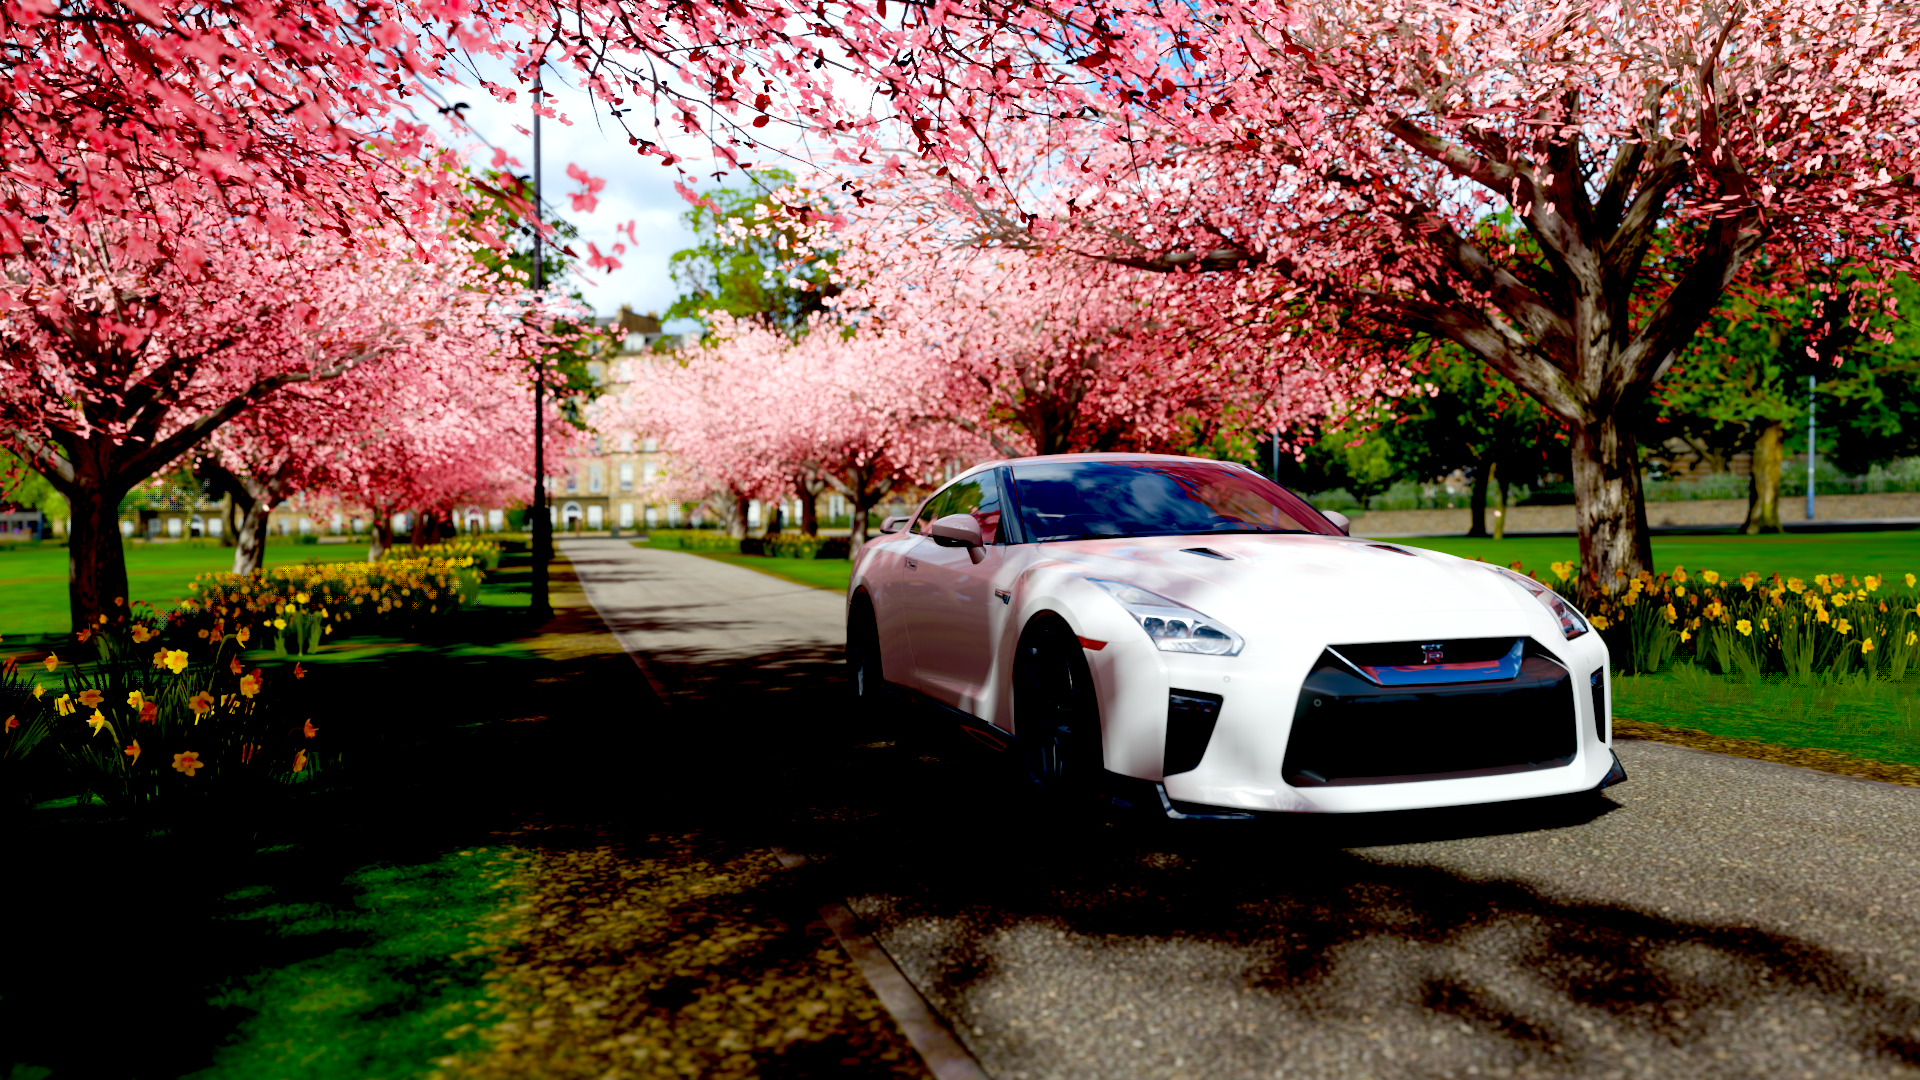 Forza Horizon 4 GTR R33 Video Games Car Screen Shot Vehicle White Cars 1920x1080